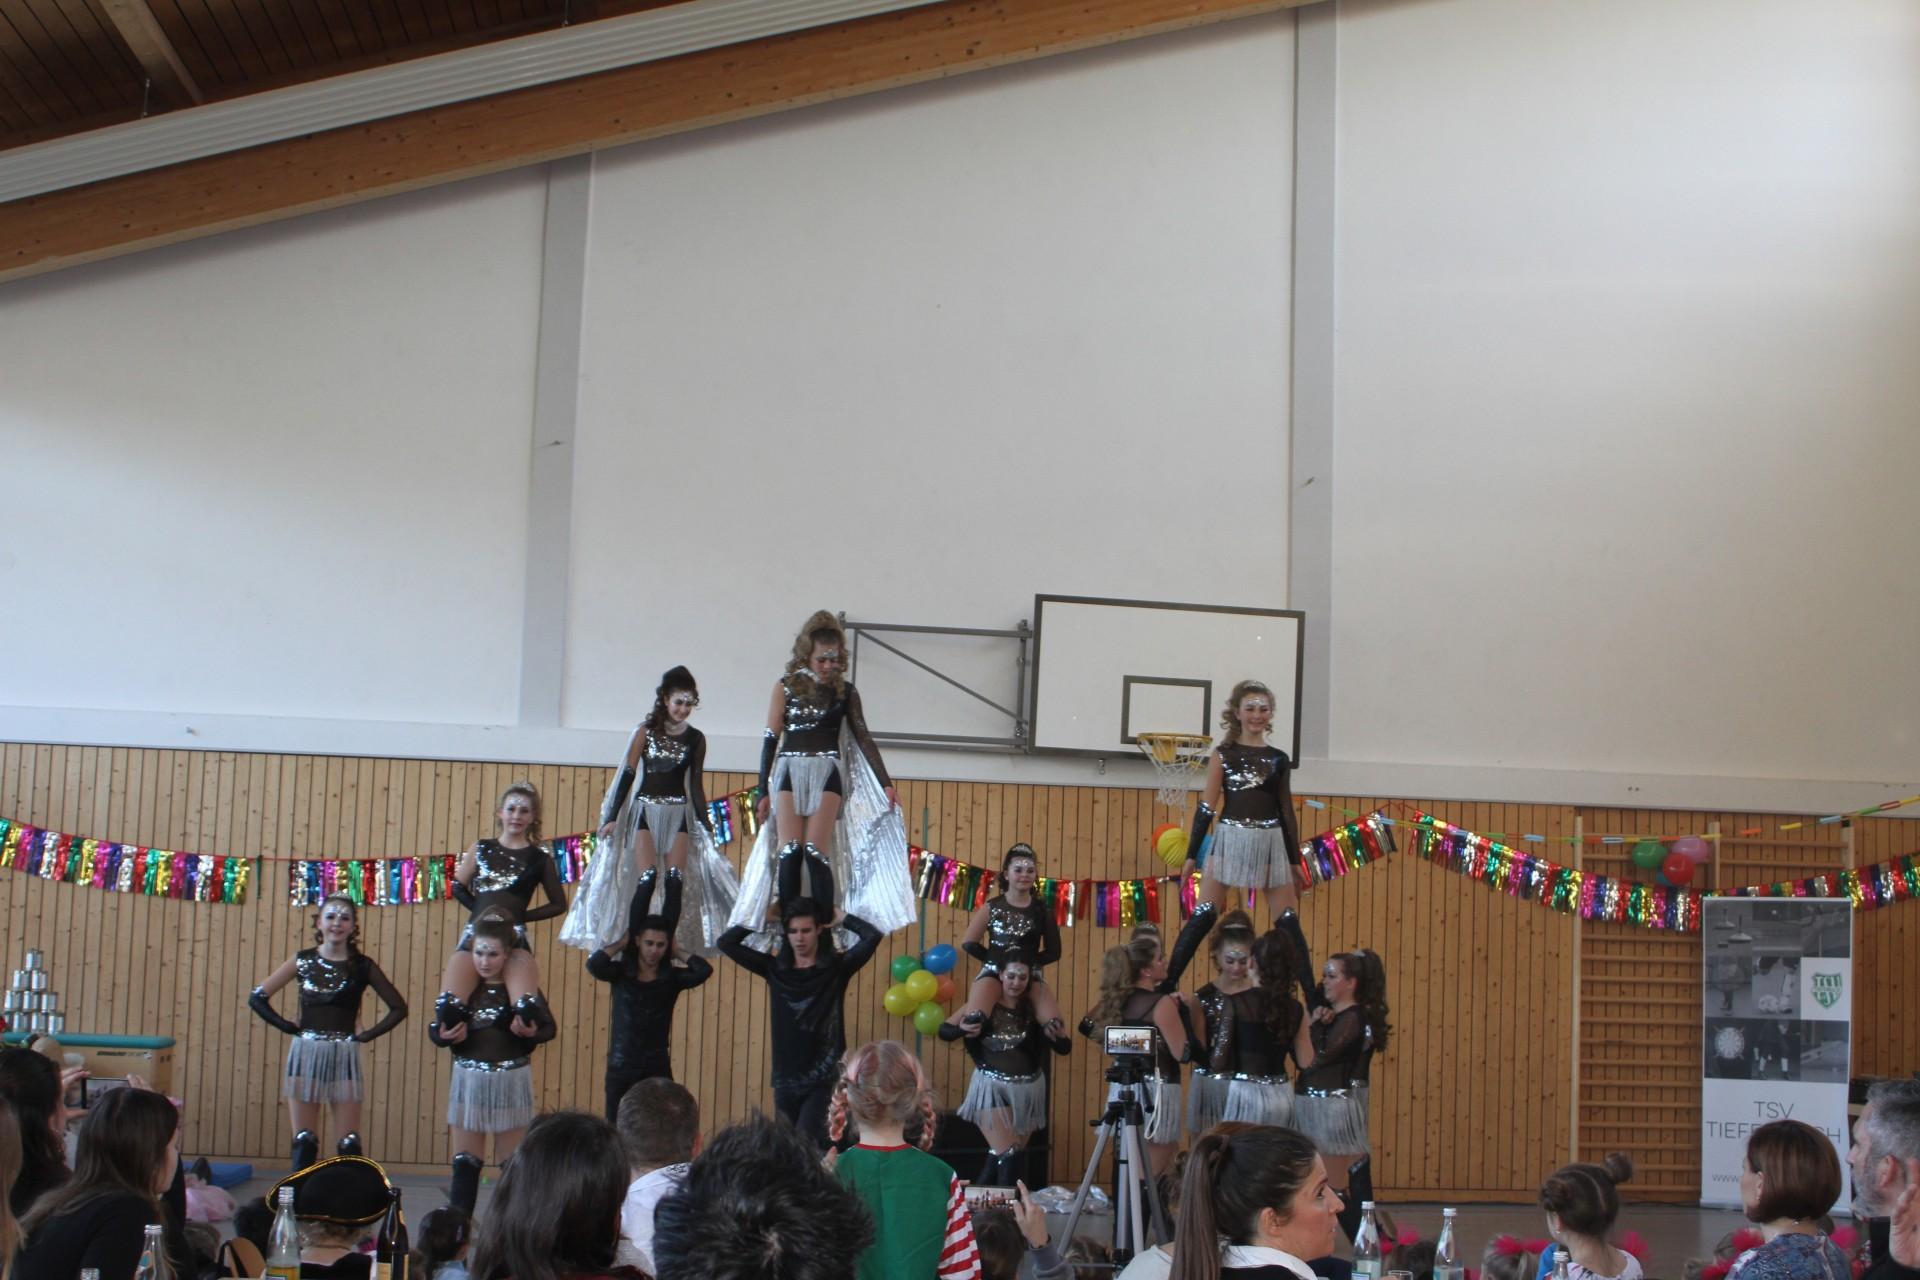 TSV Kinderfasching 2020 (202)